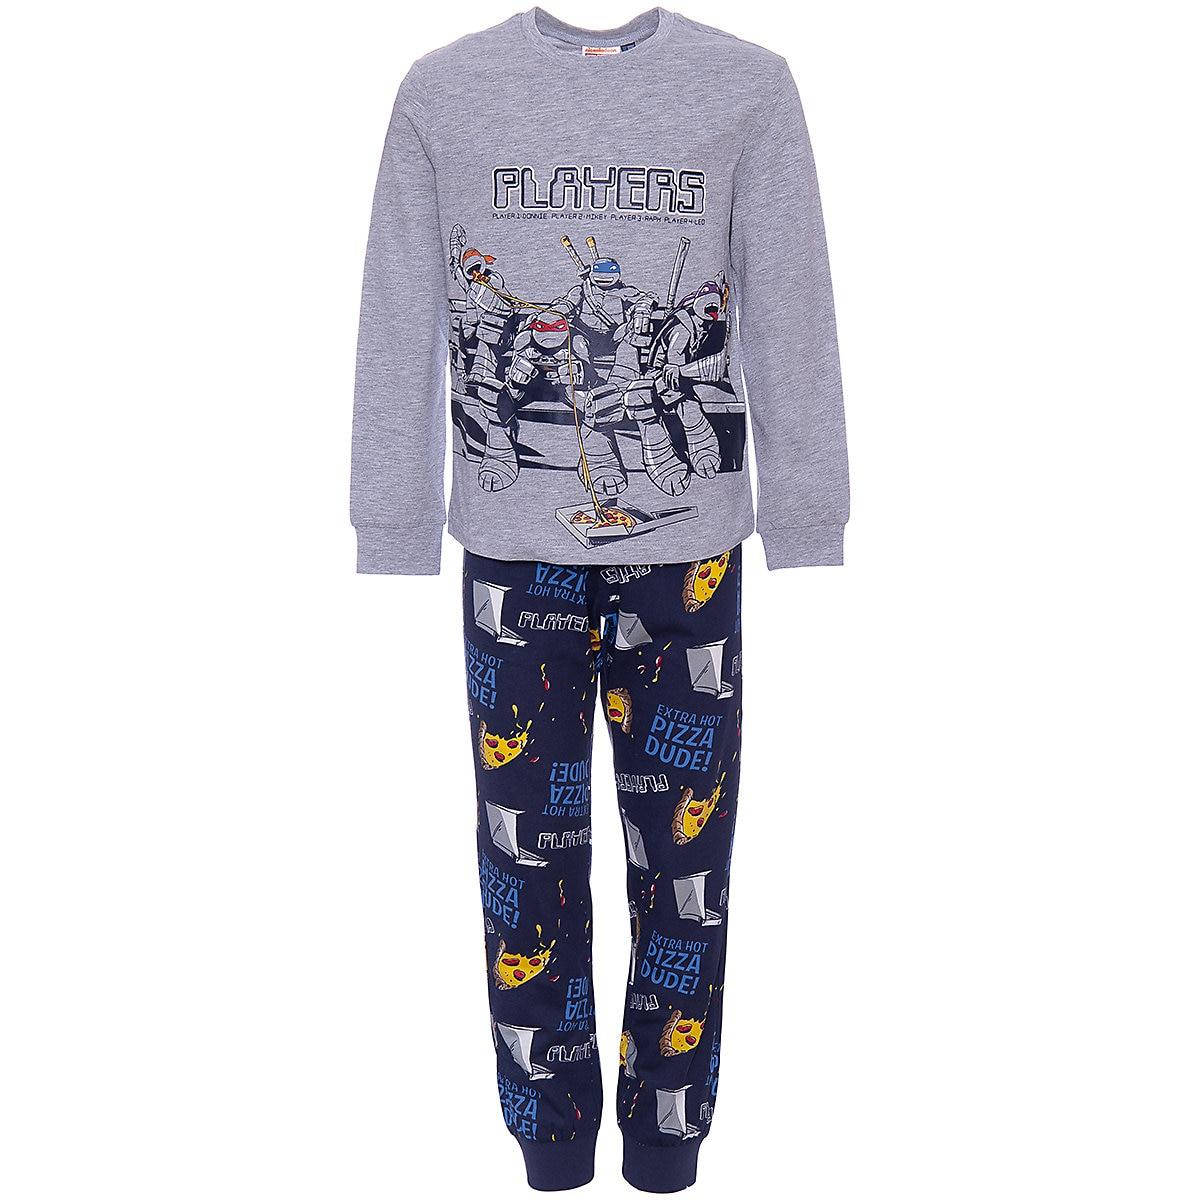 ORIGINAL MARINES Sleepwear & Robes 9502041 Cotton Baby Boys clothing pajamas wu nong wudang tai chi clothing robes uniforms surplices men and women hanfu taijiquan clothing coat winter thick robe